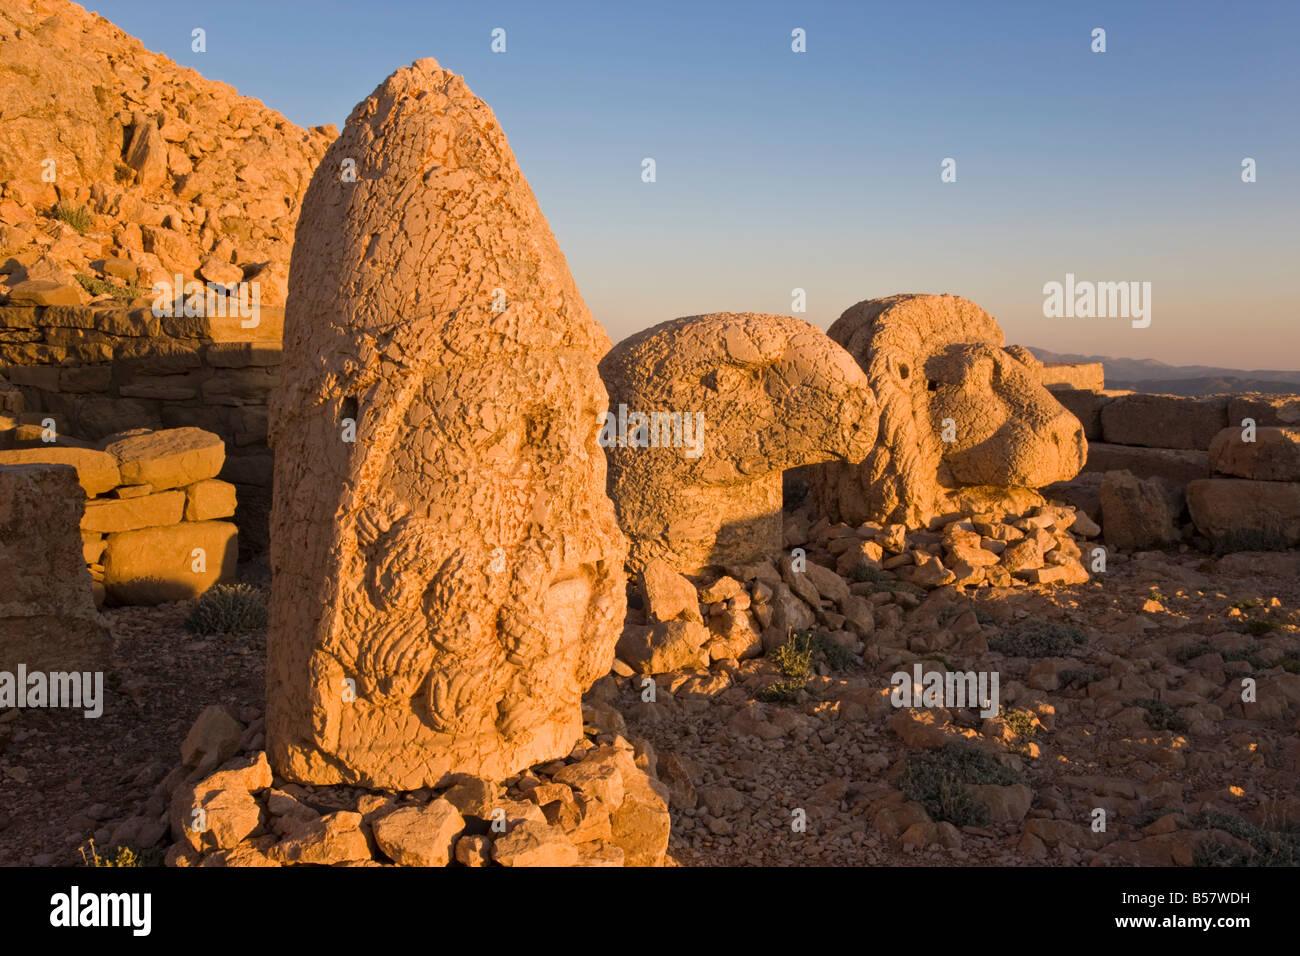 Ancient carved stone heads of the gods, Nemrut Dagi, on the summit of Mount Nemrut, Anatolia, Turkey Minor - Stock Image